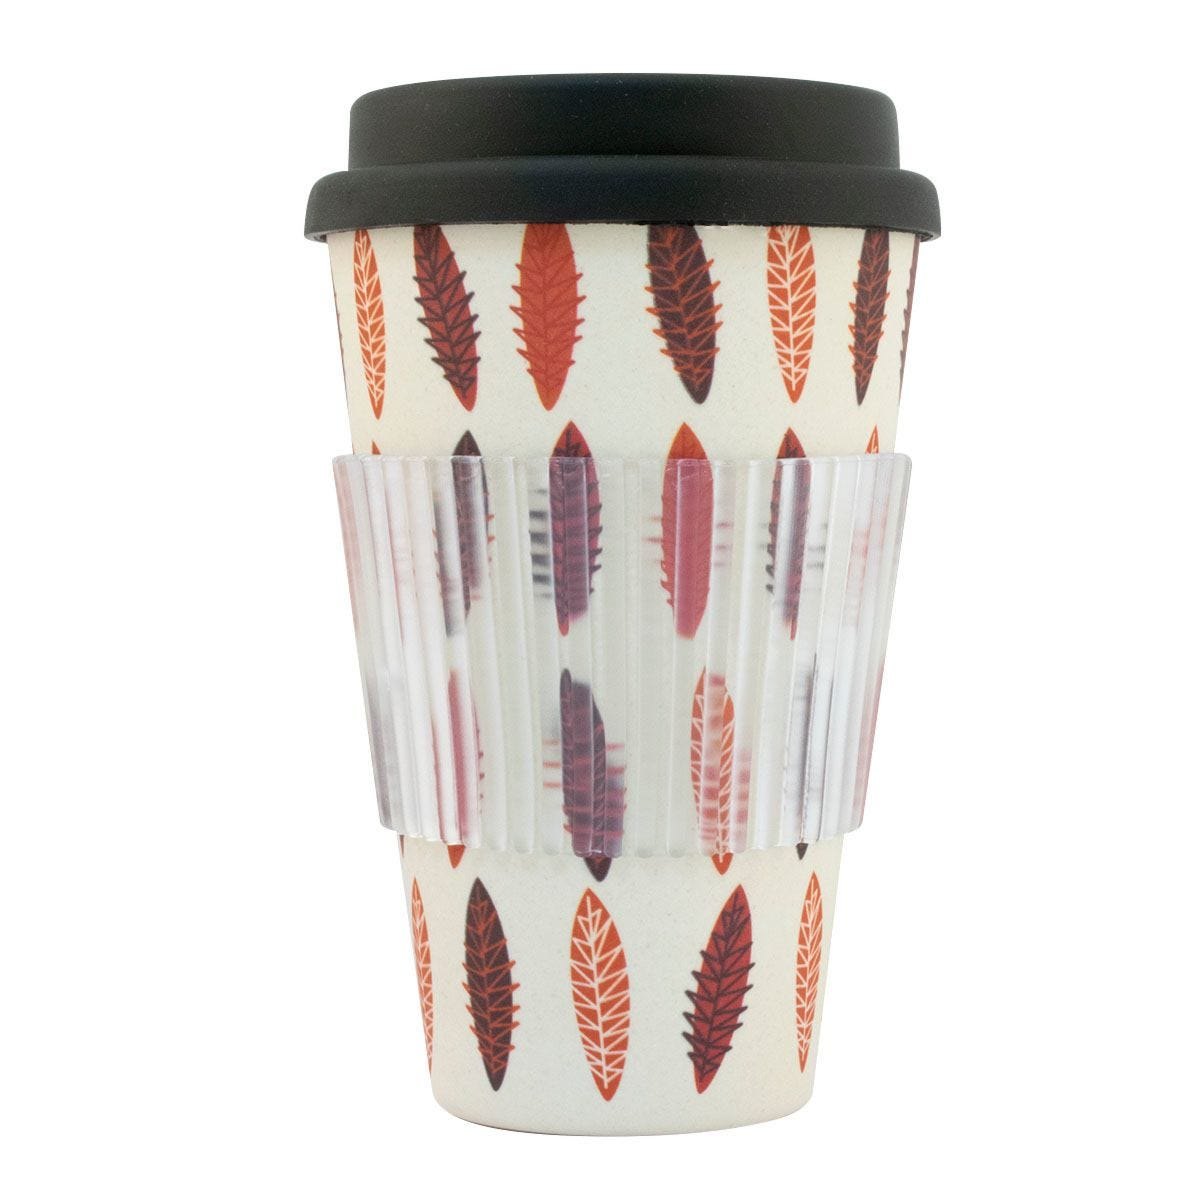 Bamboo Travel Mug - Brown Leaves